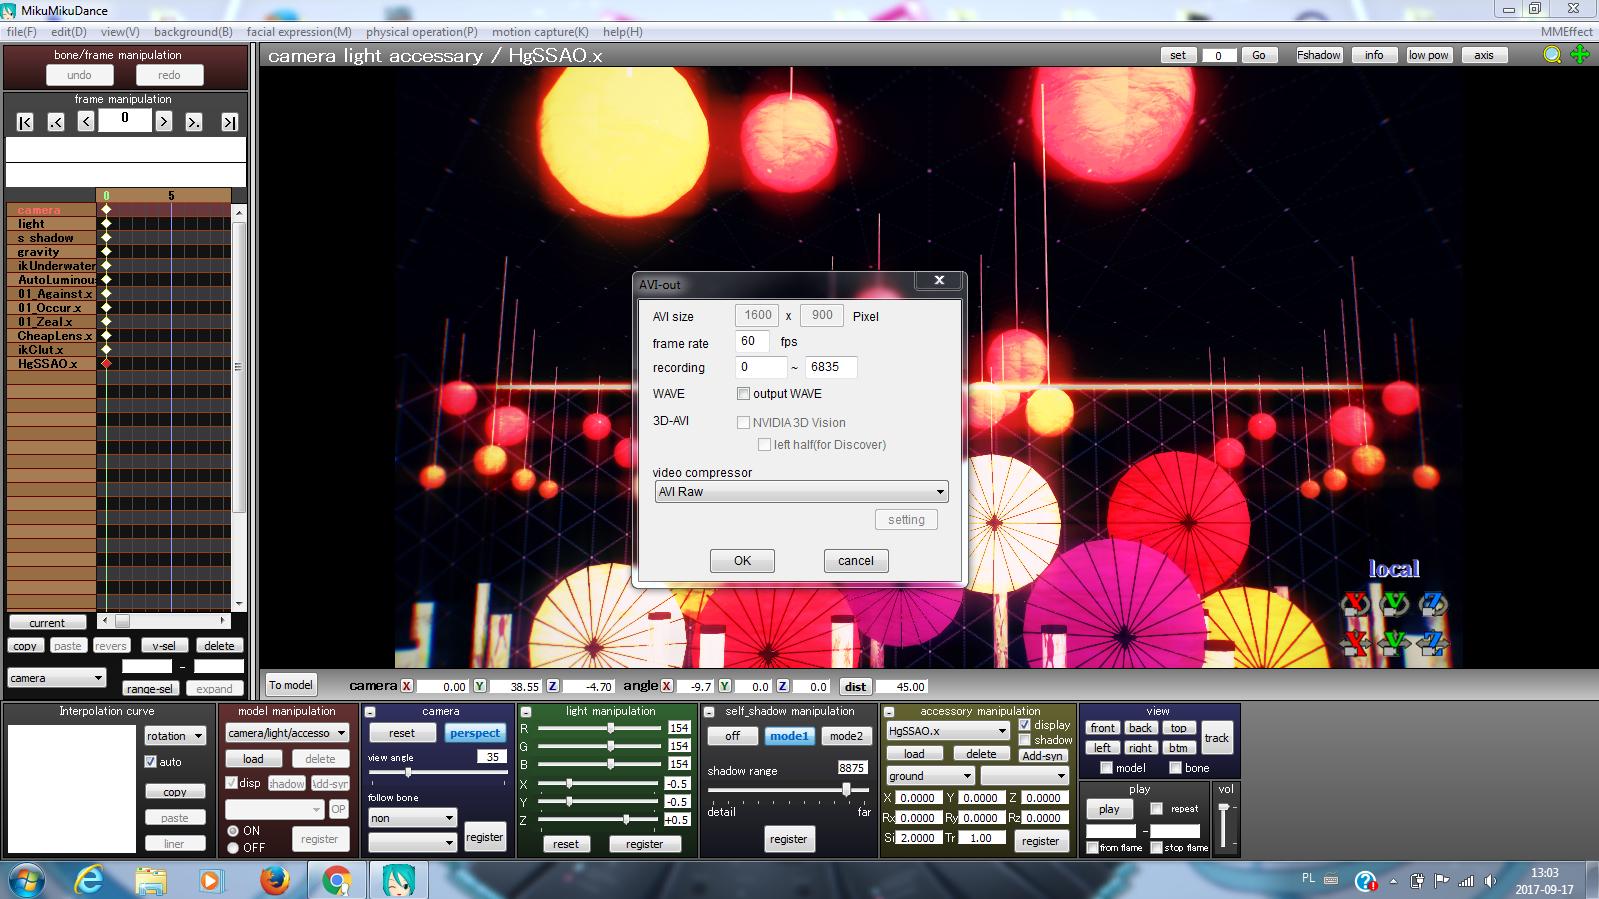 tutorial jak renderowa� filmiki w mmd ��my art studio��